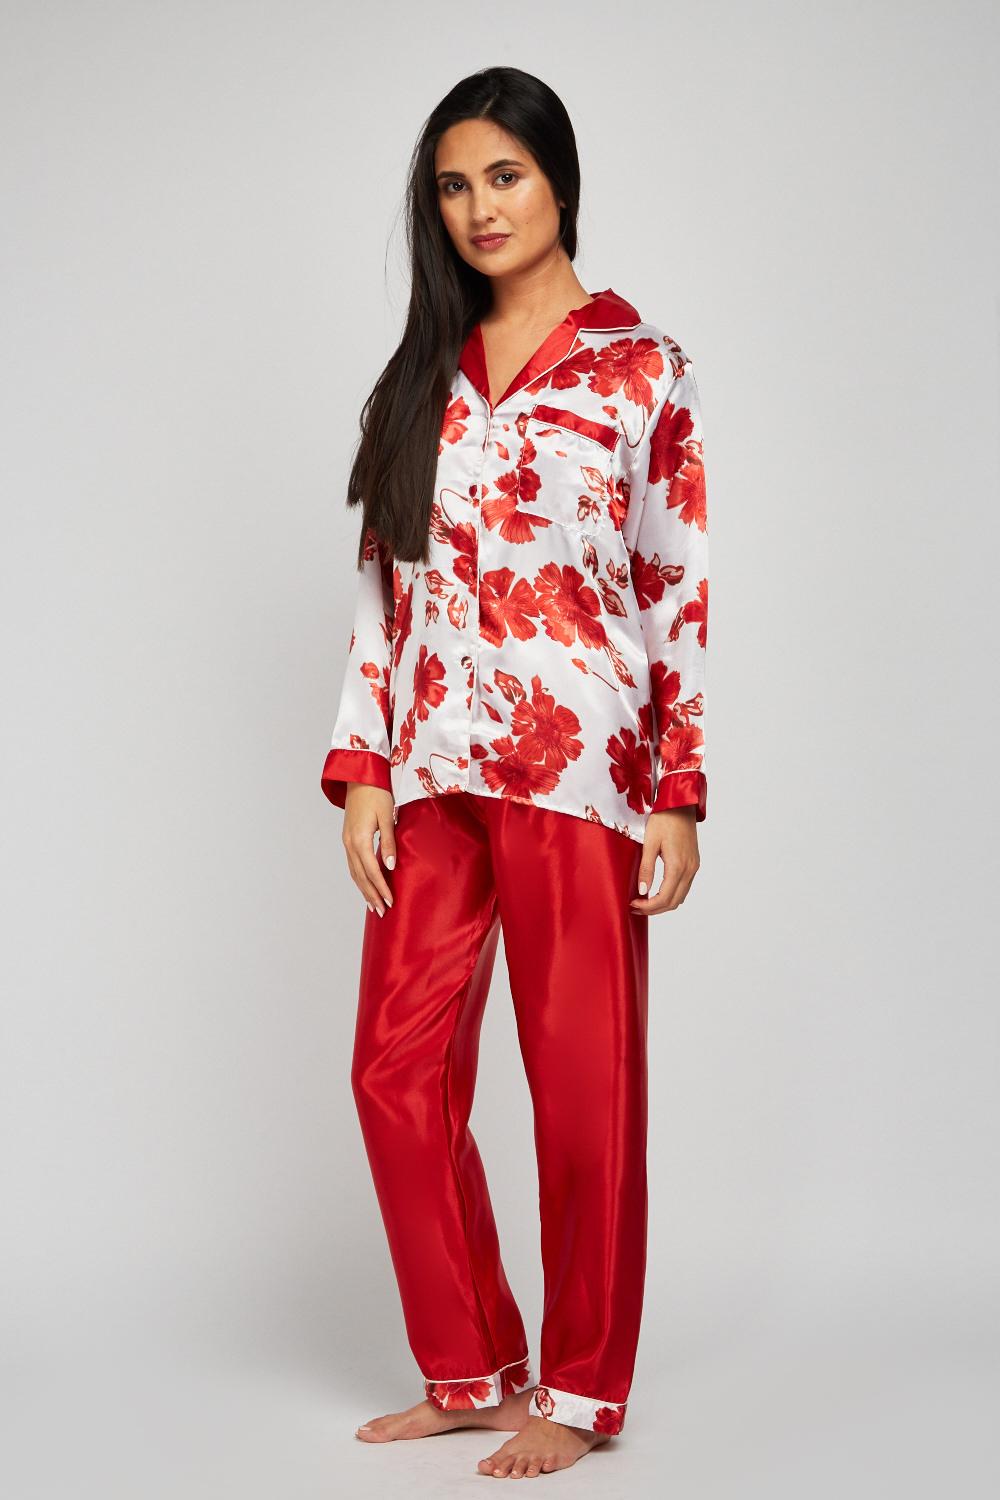 752a391f5b Floral Sateen Pyjama Set - Red - Just £5